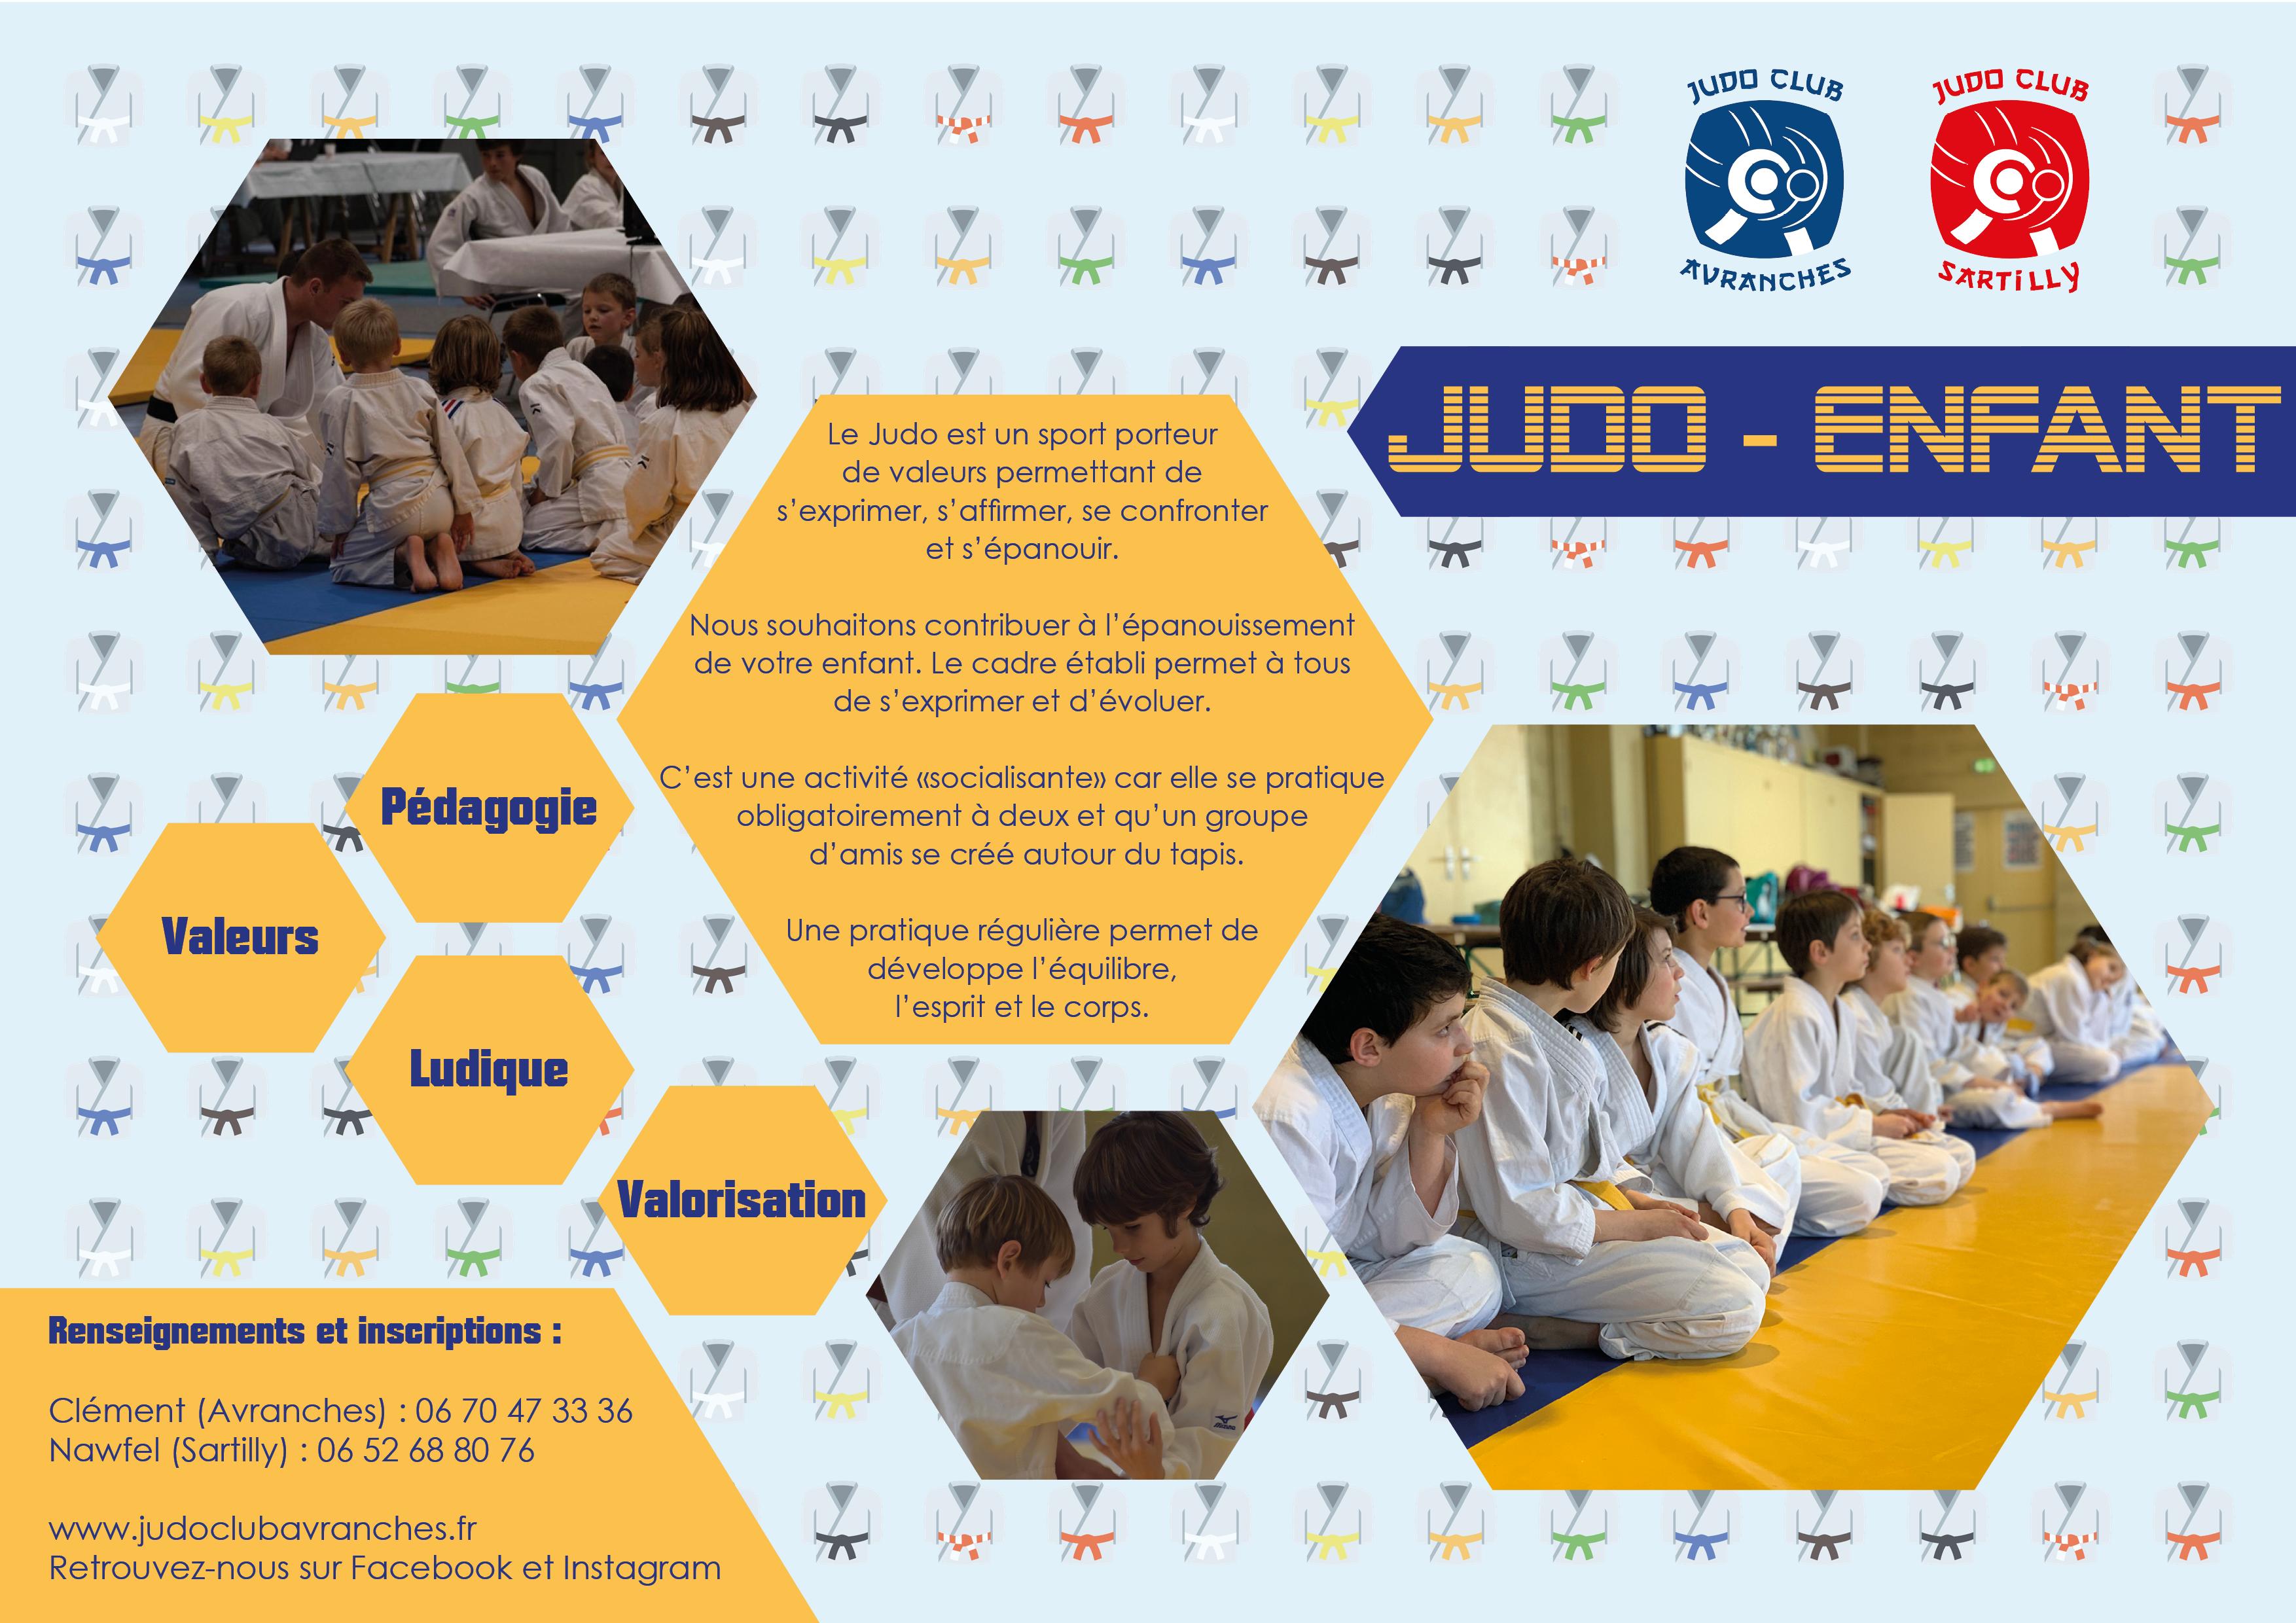 Découvrez nos activités : Judo, Baby Judo, Taïso, Ju-Jitsu